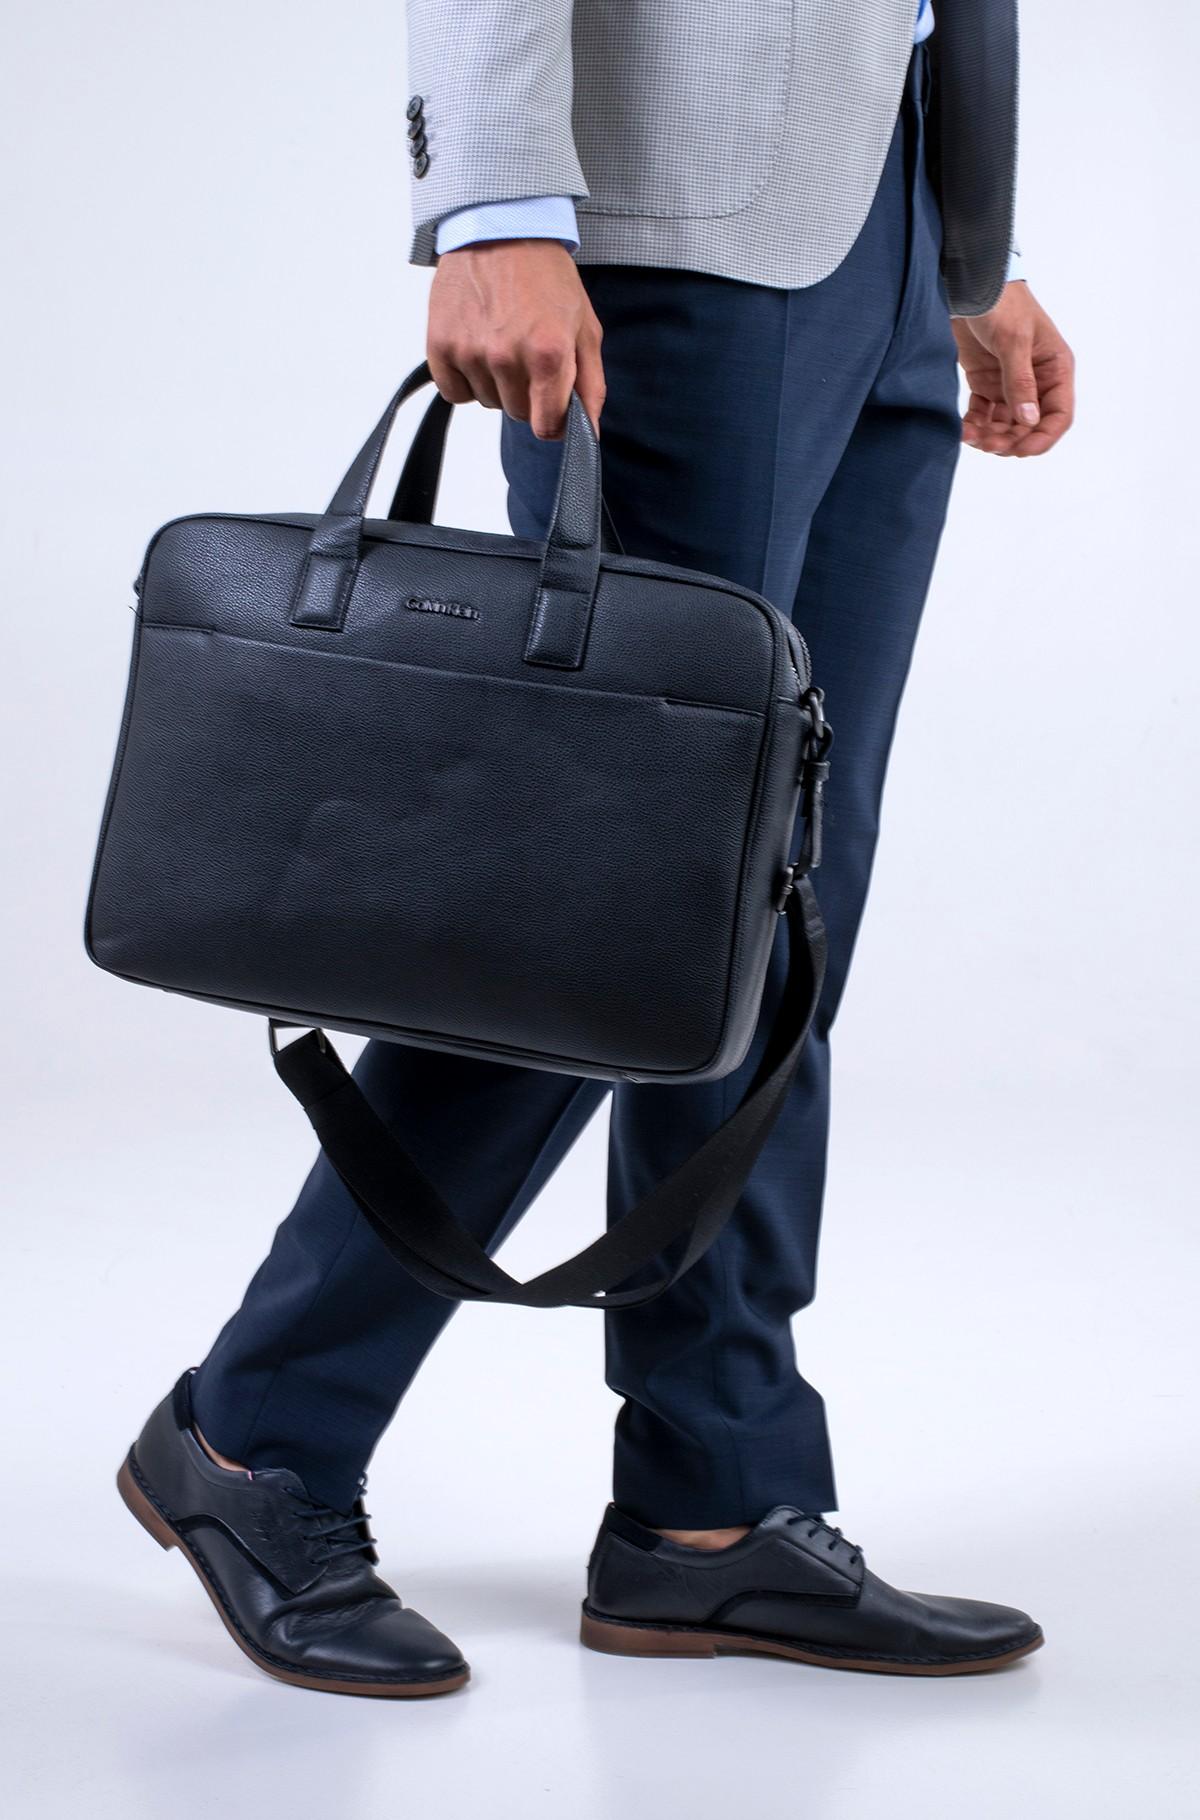 Kompiuterio krepšys  2G LAPTOP BAG K50K506310-full-1